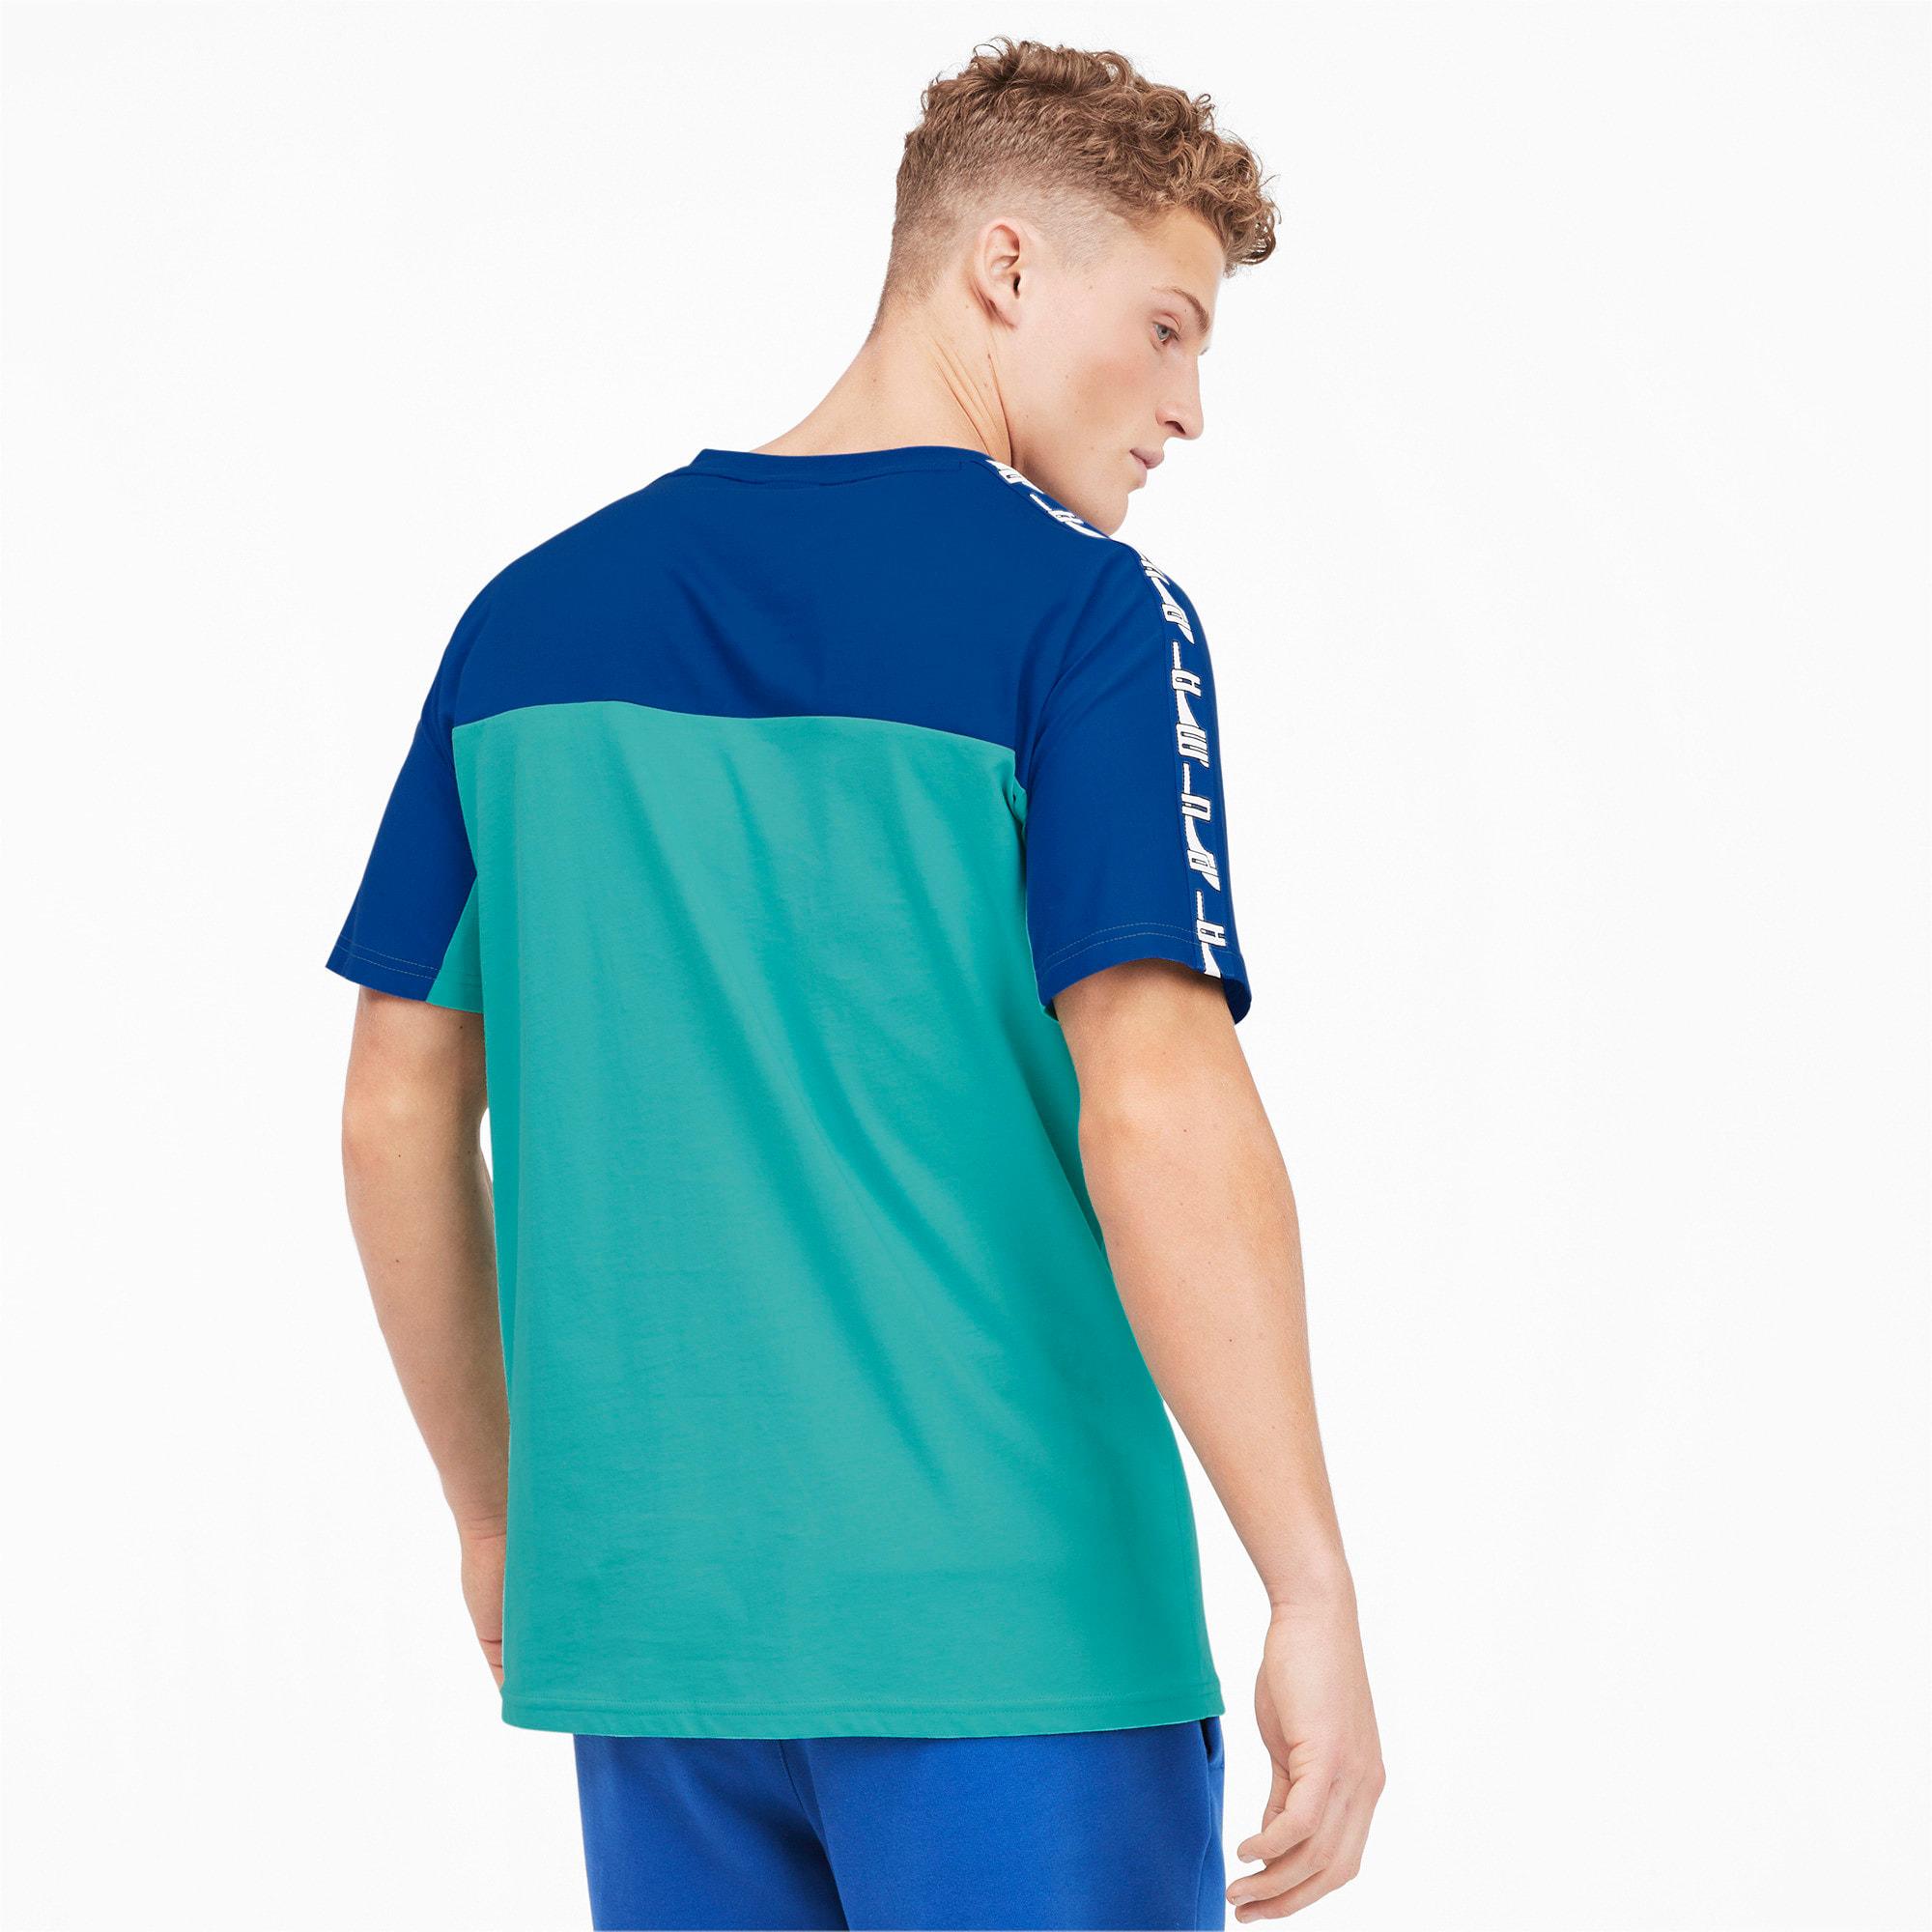 Thumbnail 3 of PUMA XTG SS Tシャツ 半袖, Blue Turquoise, medium-JPN